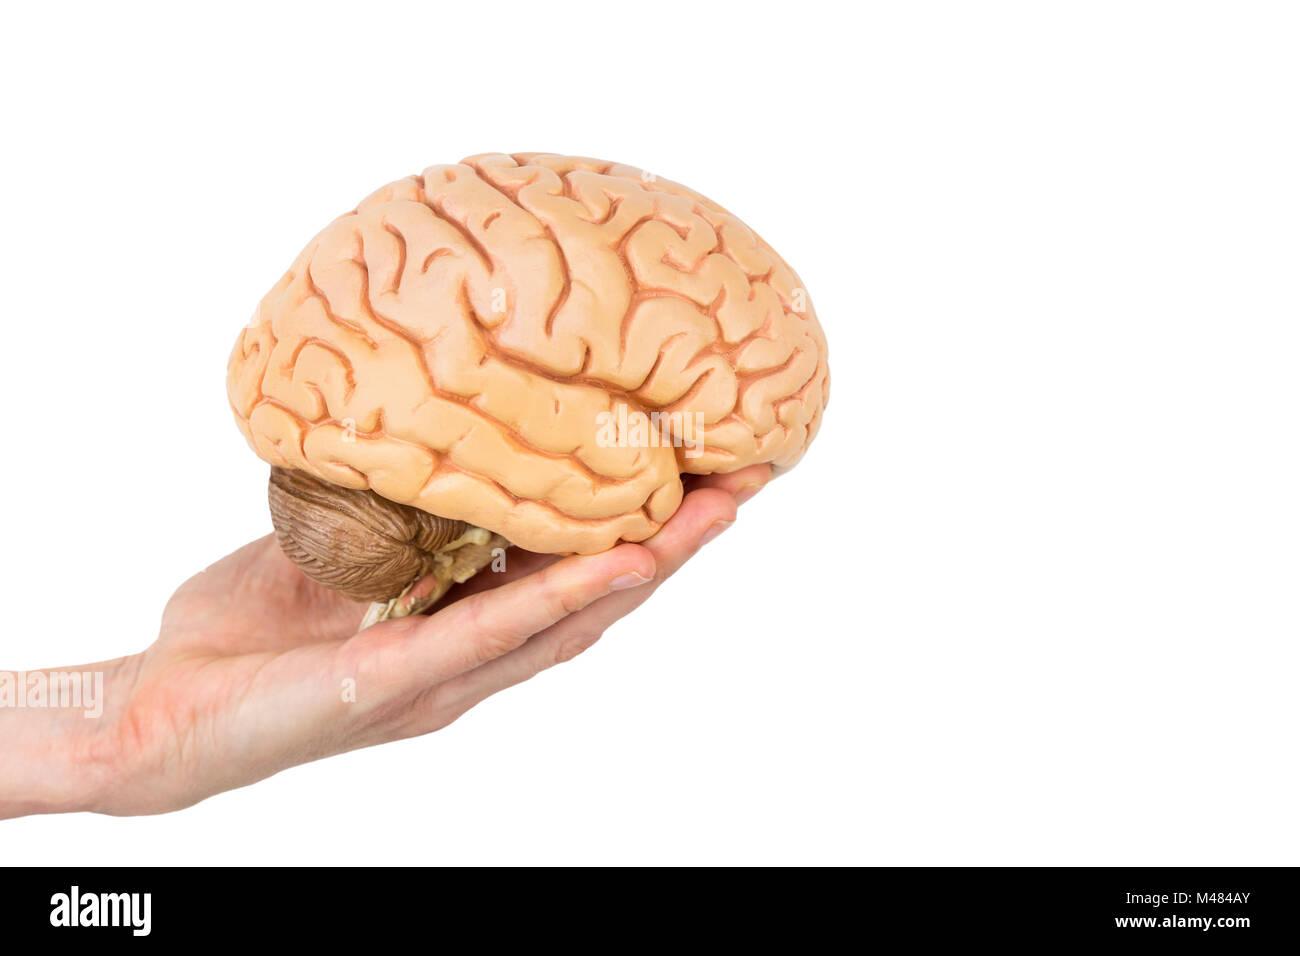 Hand holding model human brains isolated on white background - Stock Image